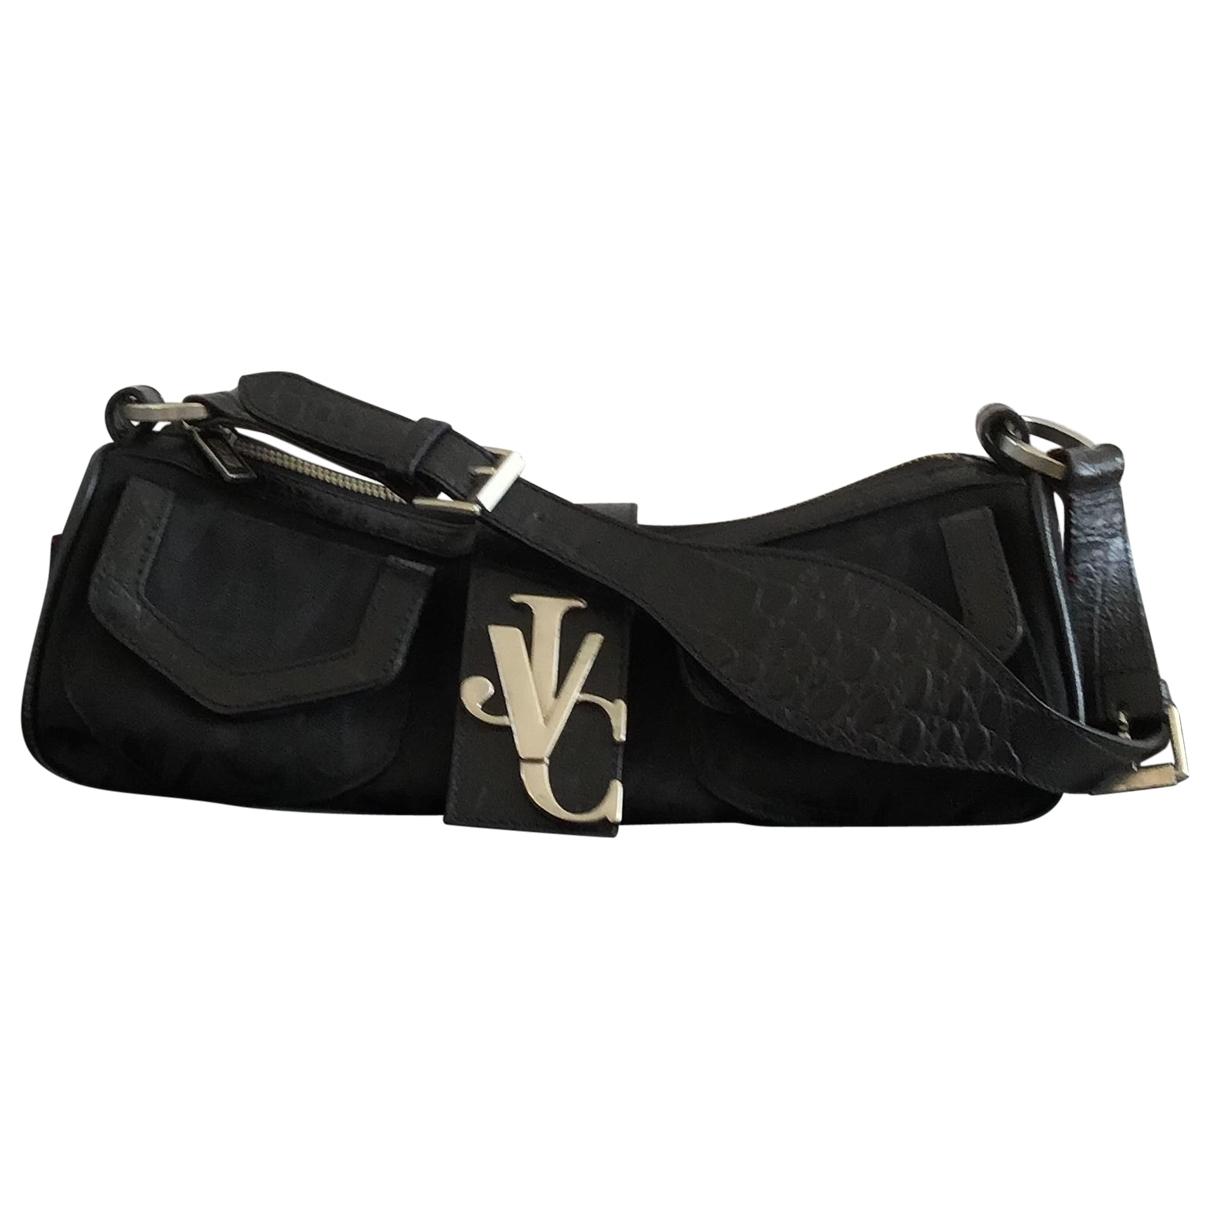 Versace Jeans \N Handtasche in  Schwarz Denim - Jeans